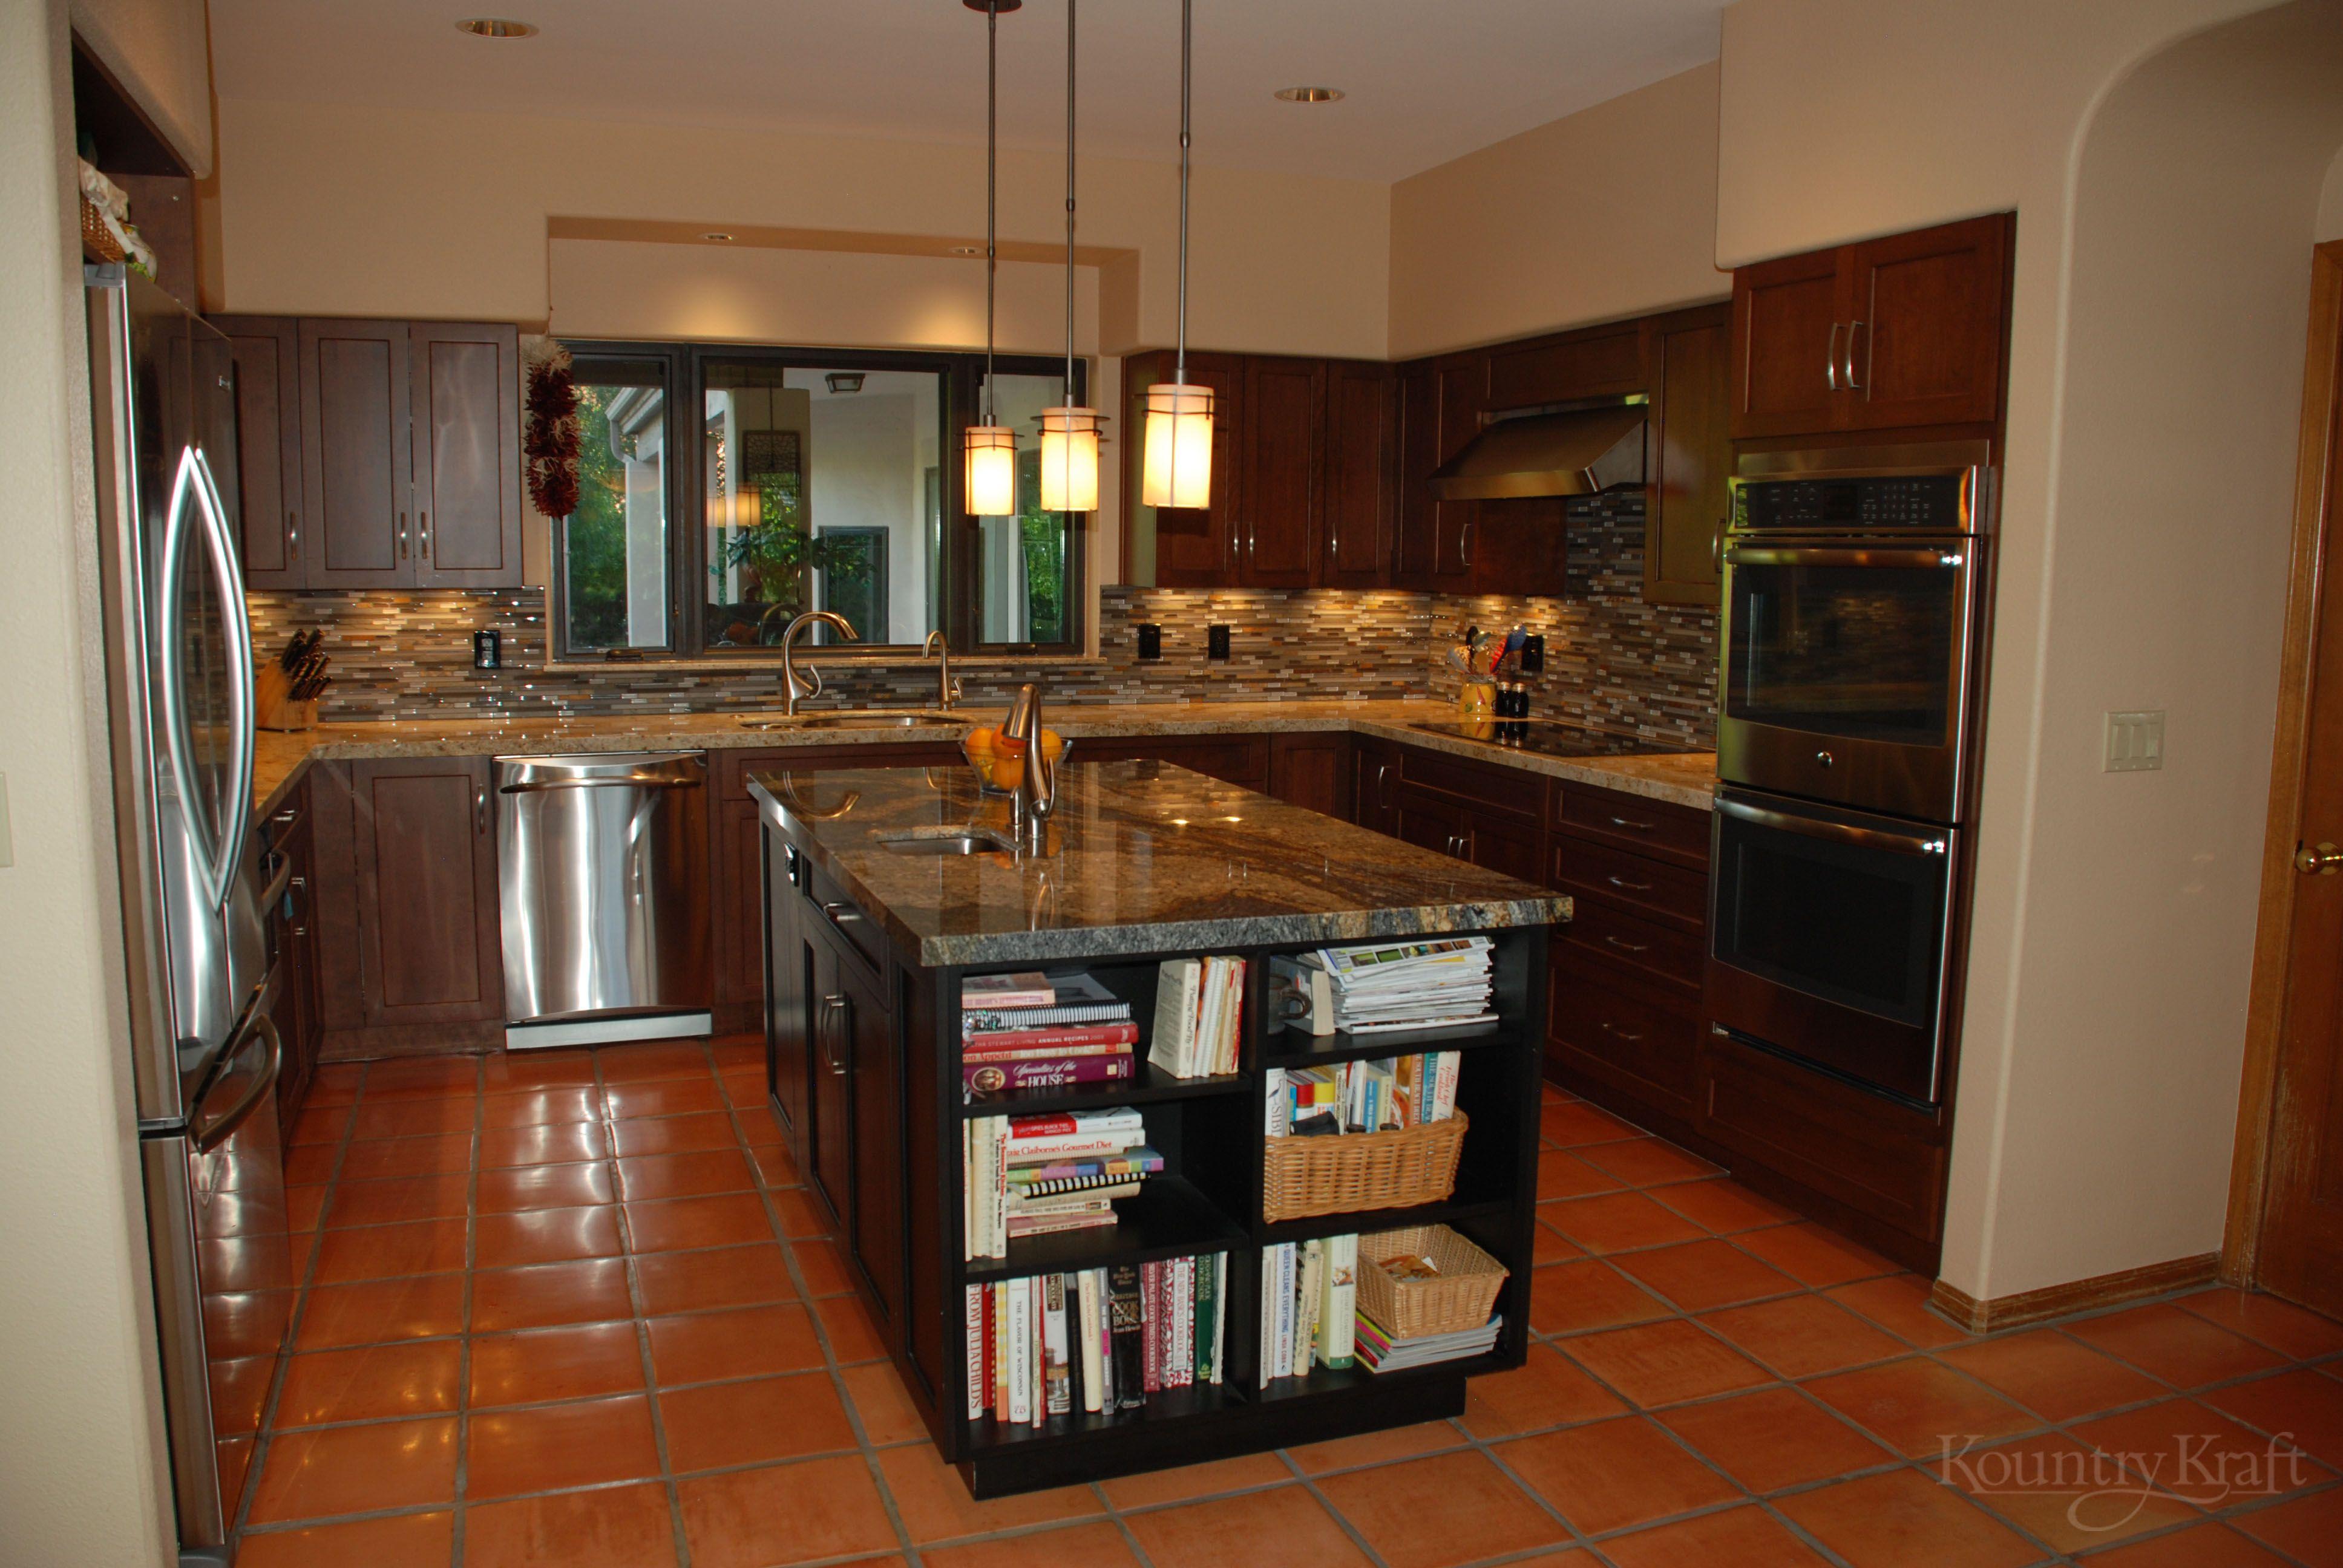 Custom Kitchen Cabinets Designed By Brian J Mcgarry Interiors In Alexandria Va Custom Kitchen Island Custom Kitchen Cabinets Design Custom Kitchen Cabinets